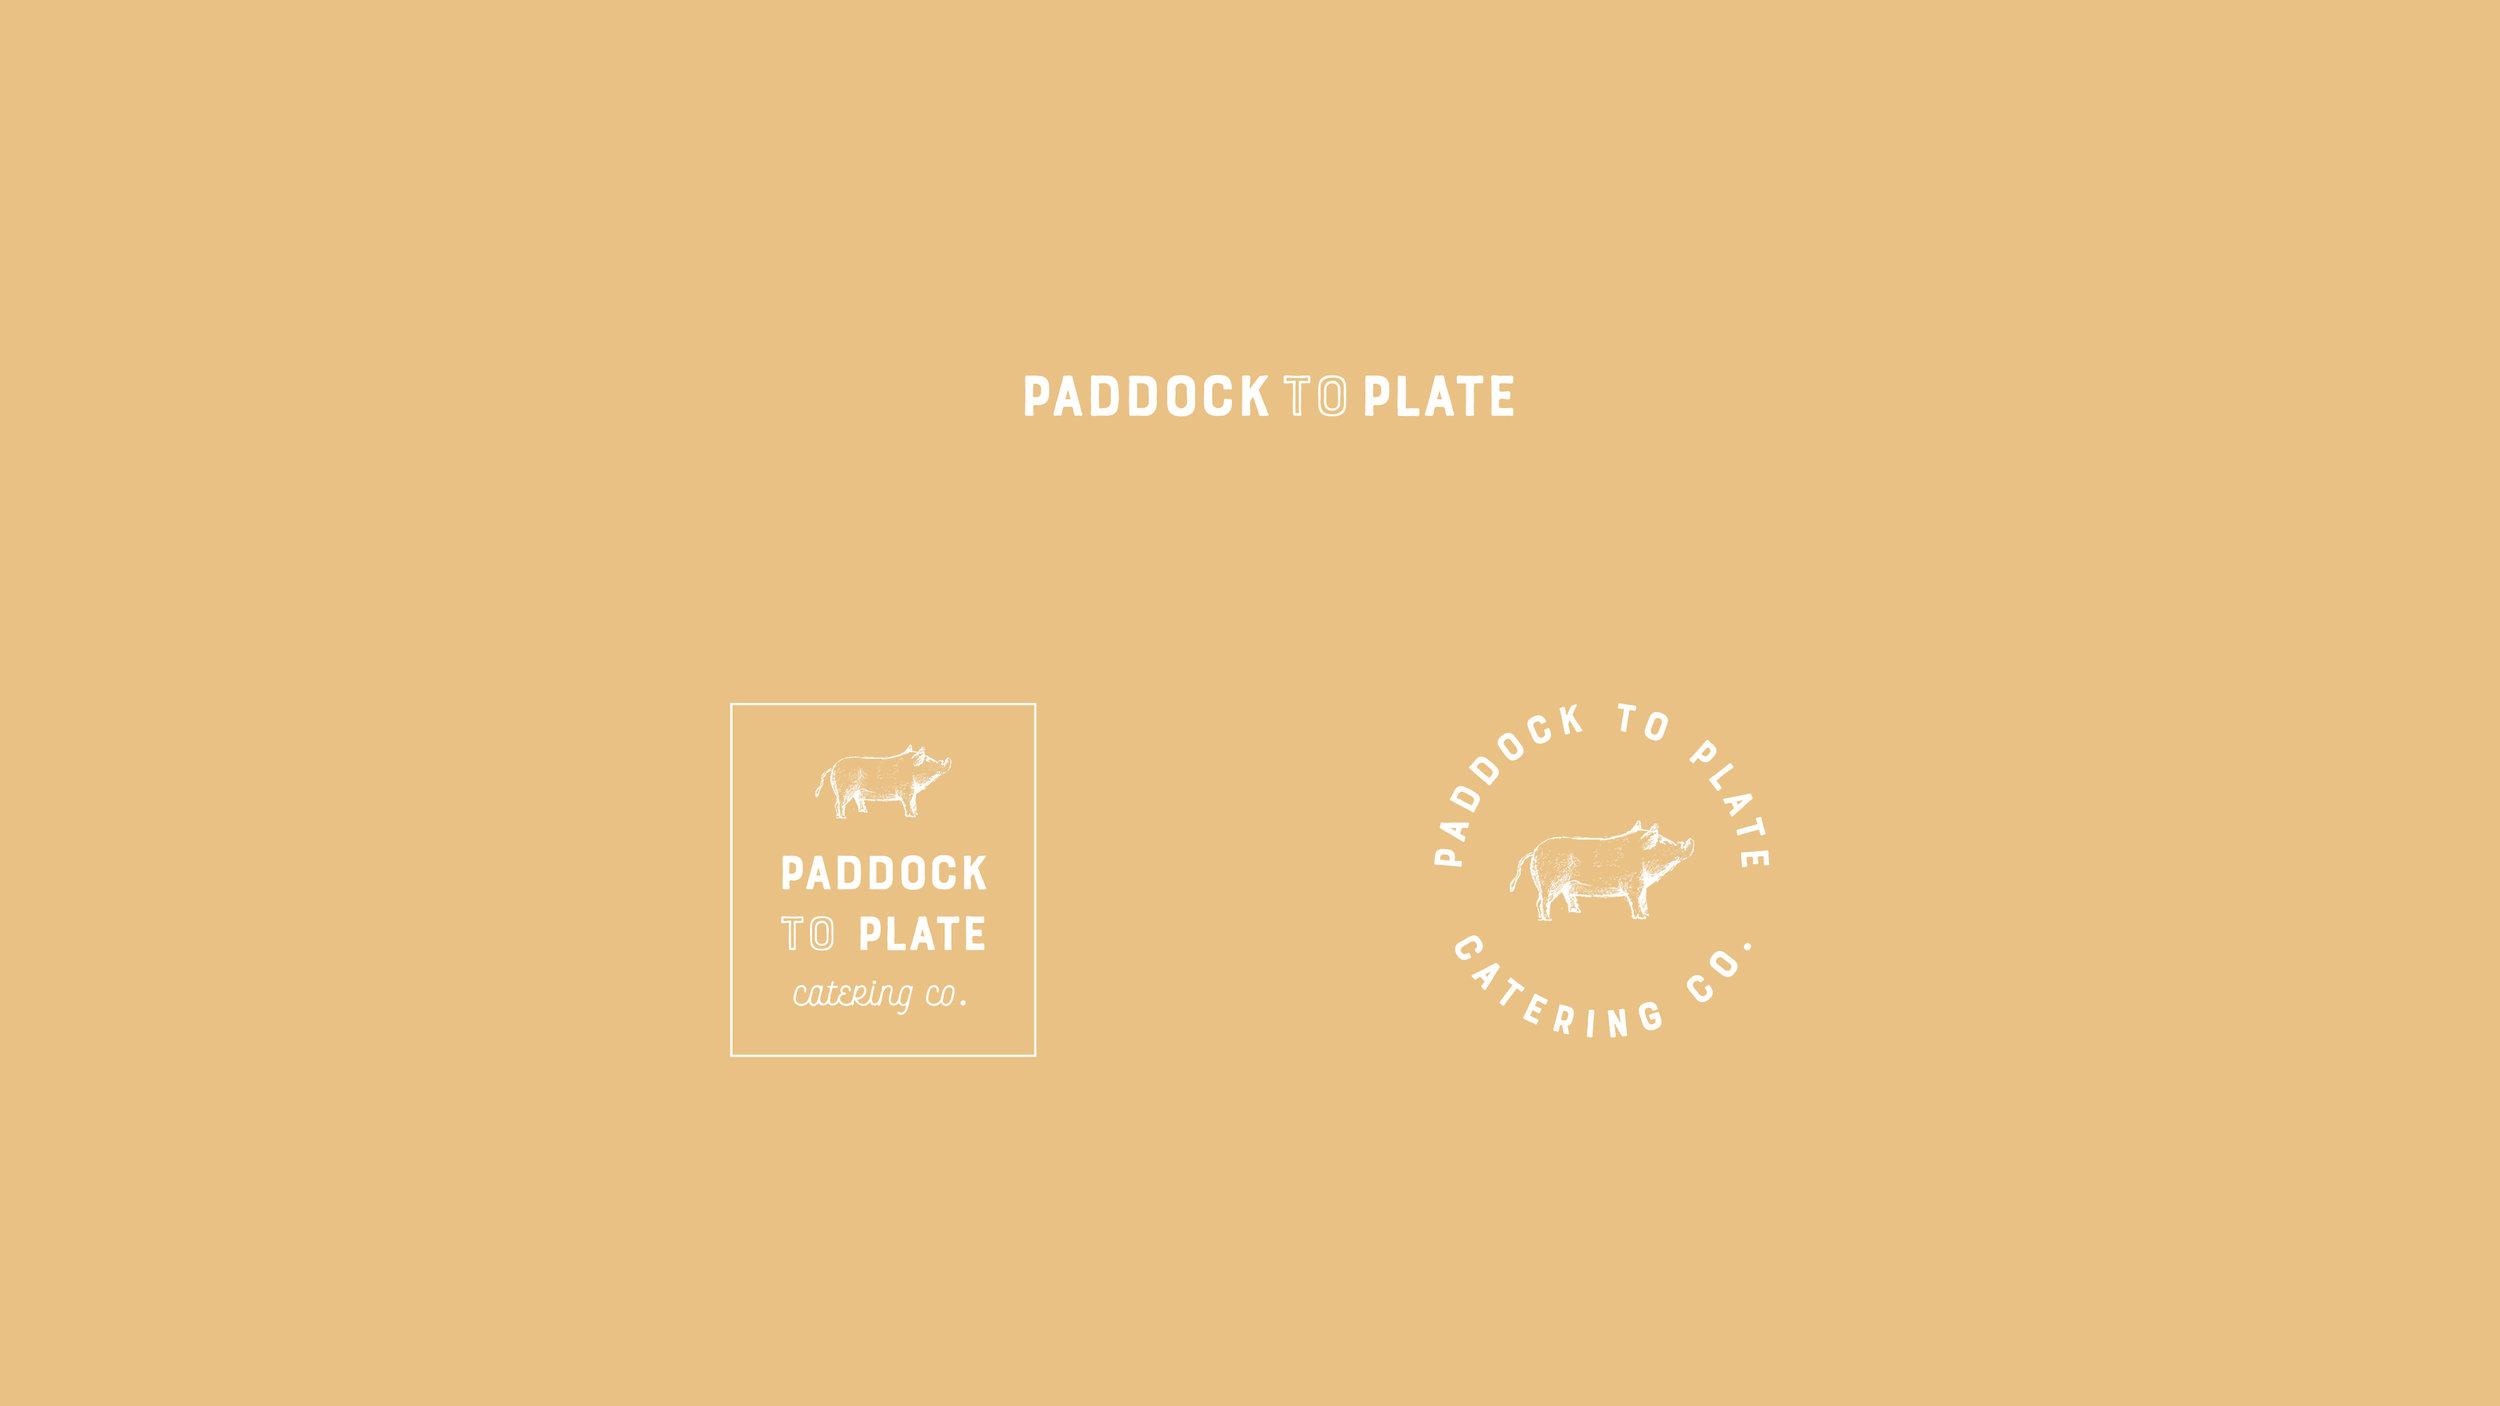 PaddocktoPlate-CaseStudy-Photos2.jpg